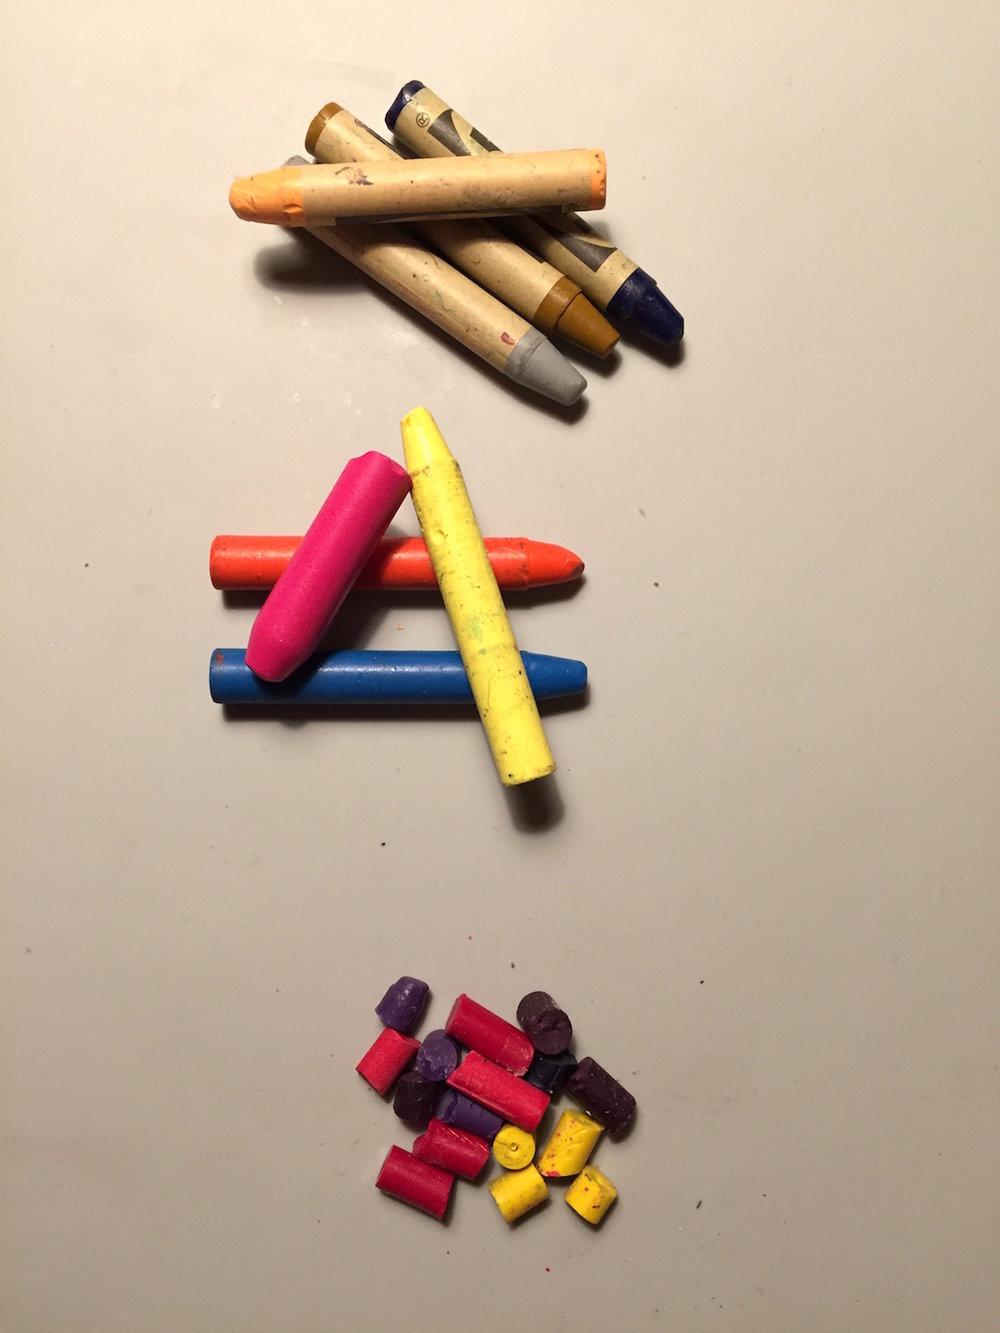 hoiberlin-wachsmalstifte-schmelzen-diy-3.jpg